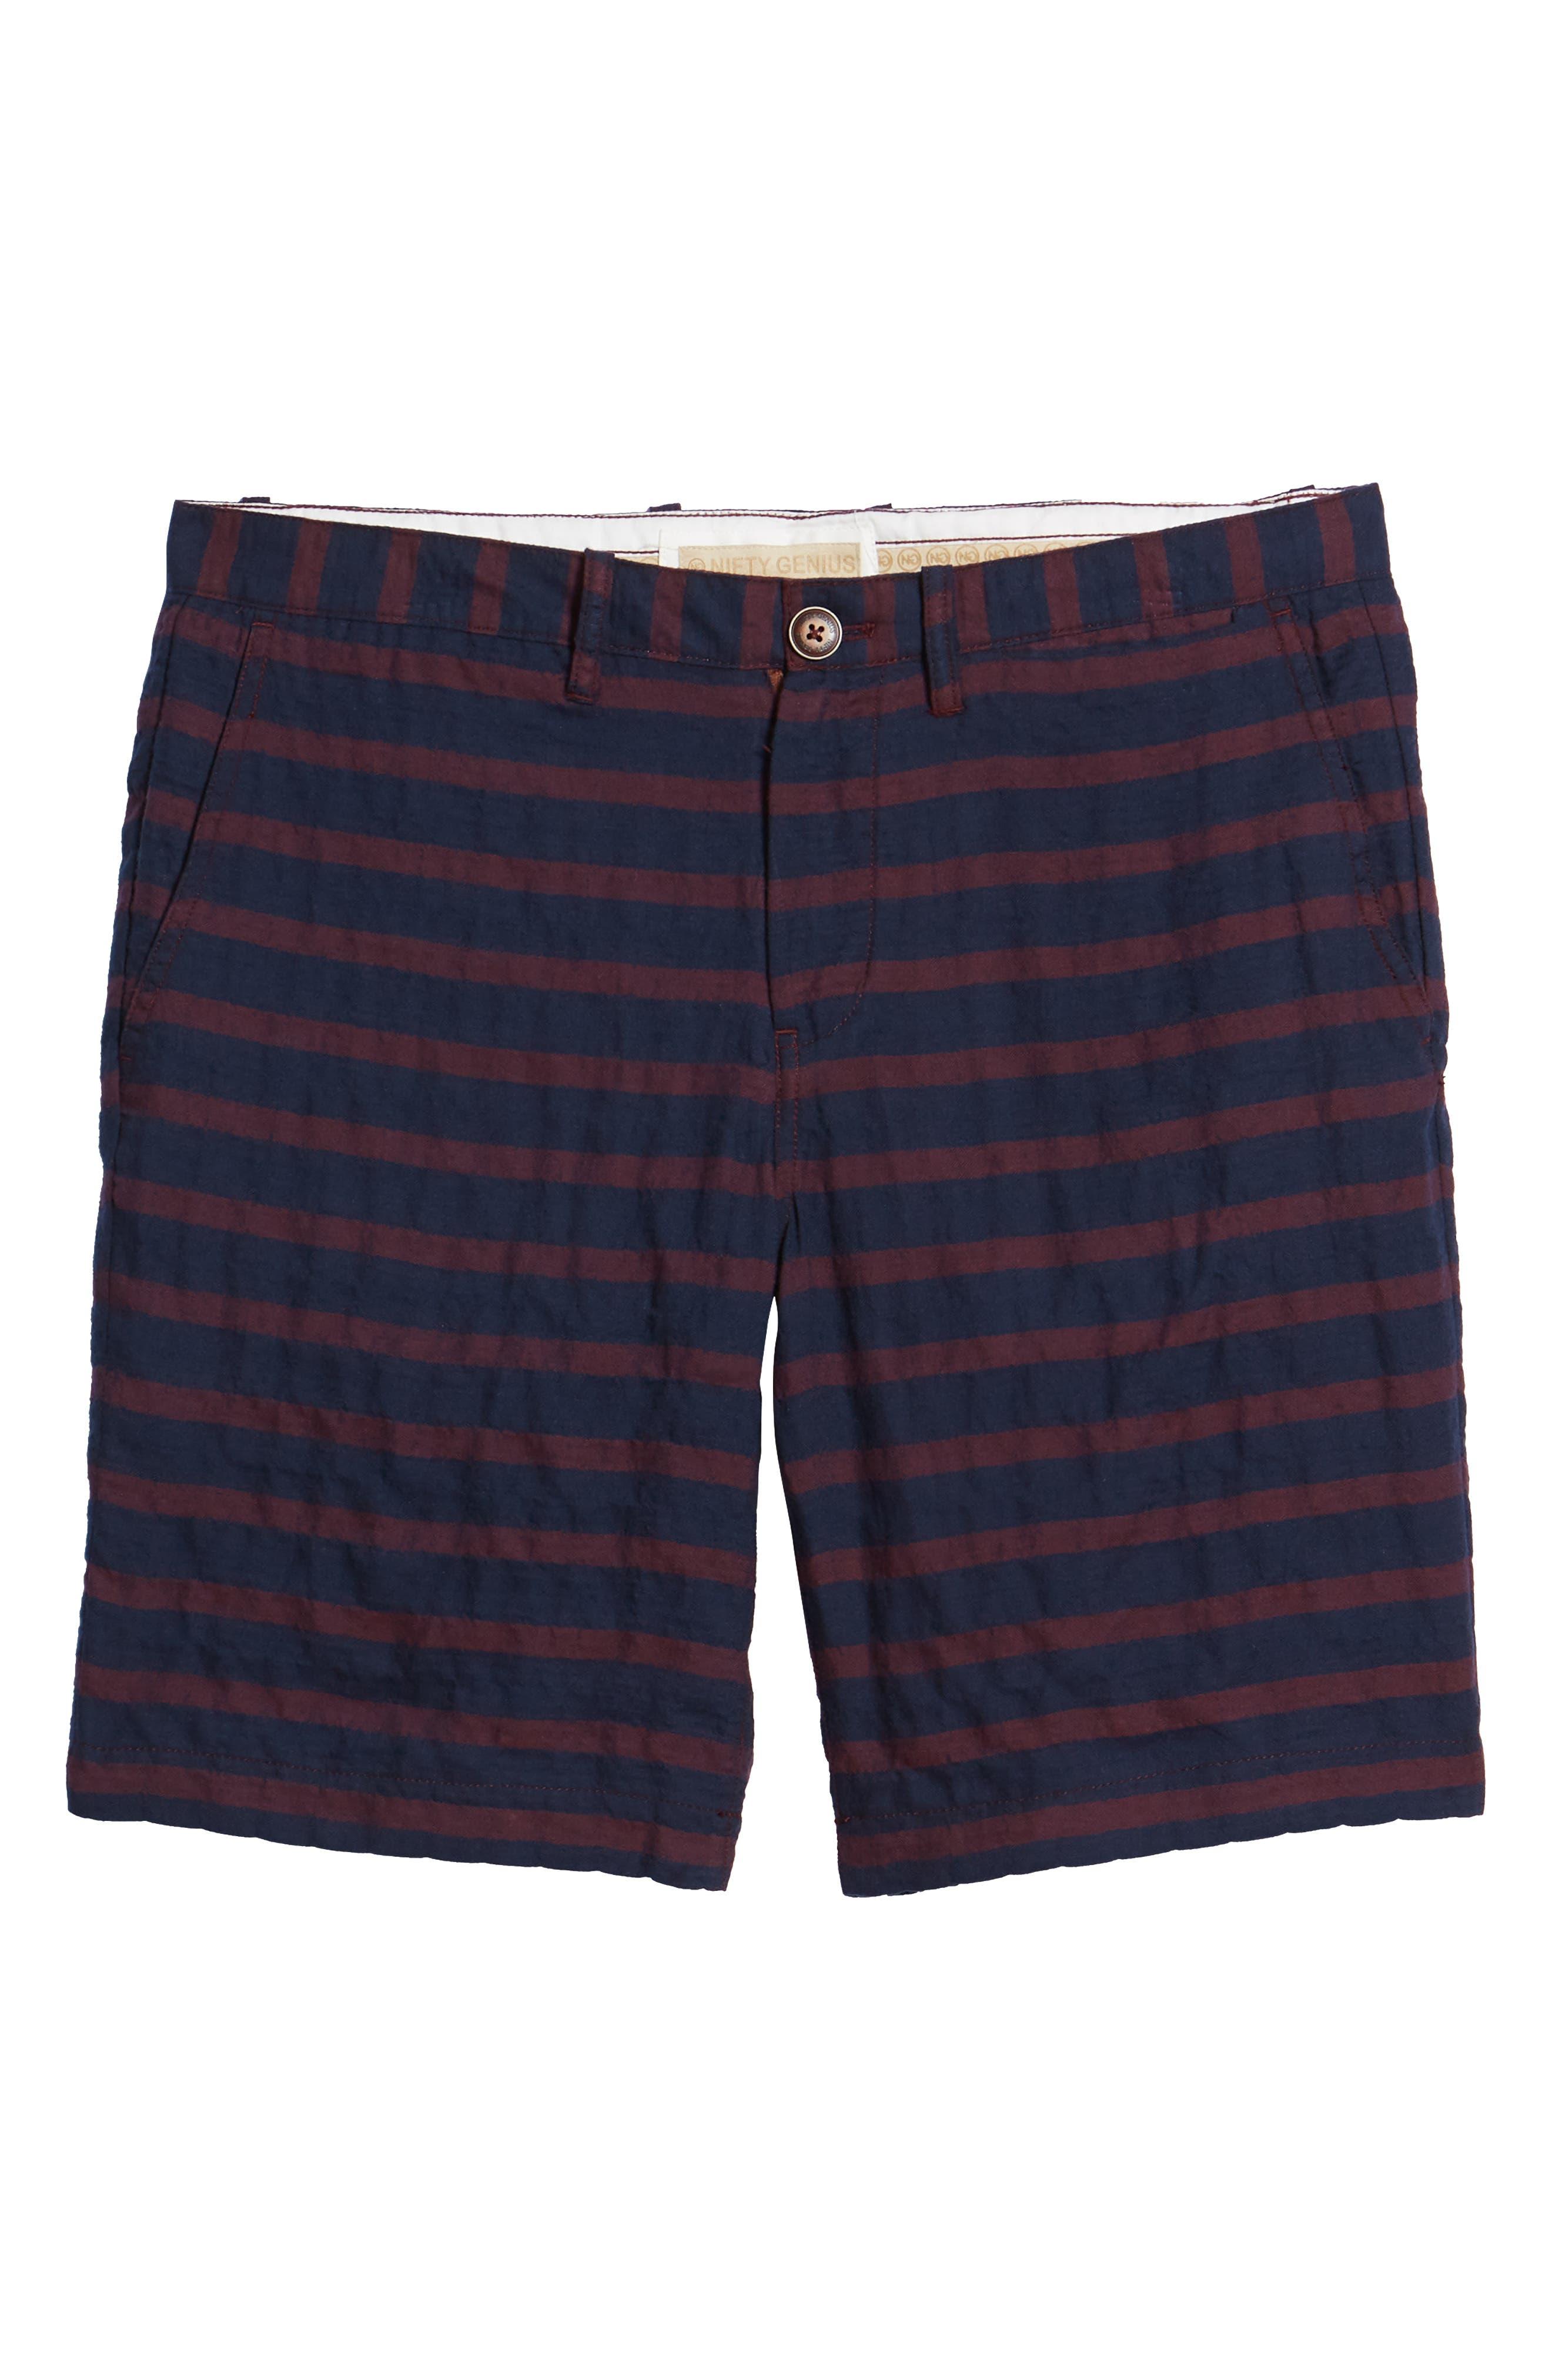 Morgan Stripe Bermuda Shorts,                             Alternate thumbnail 6, color,                             601